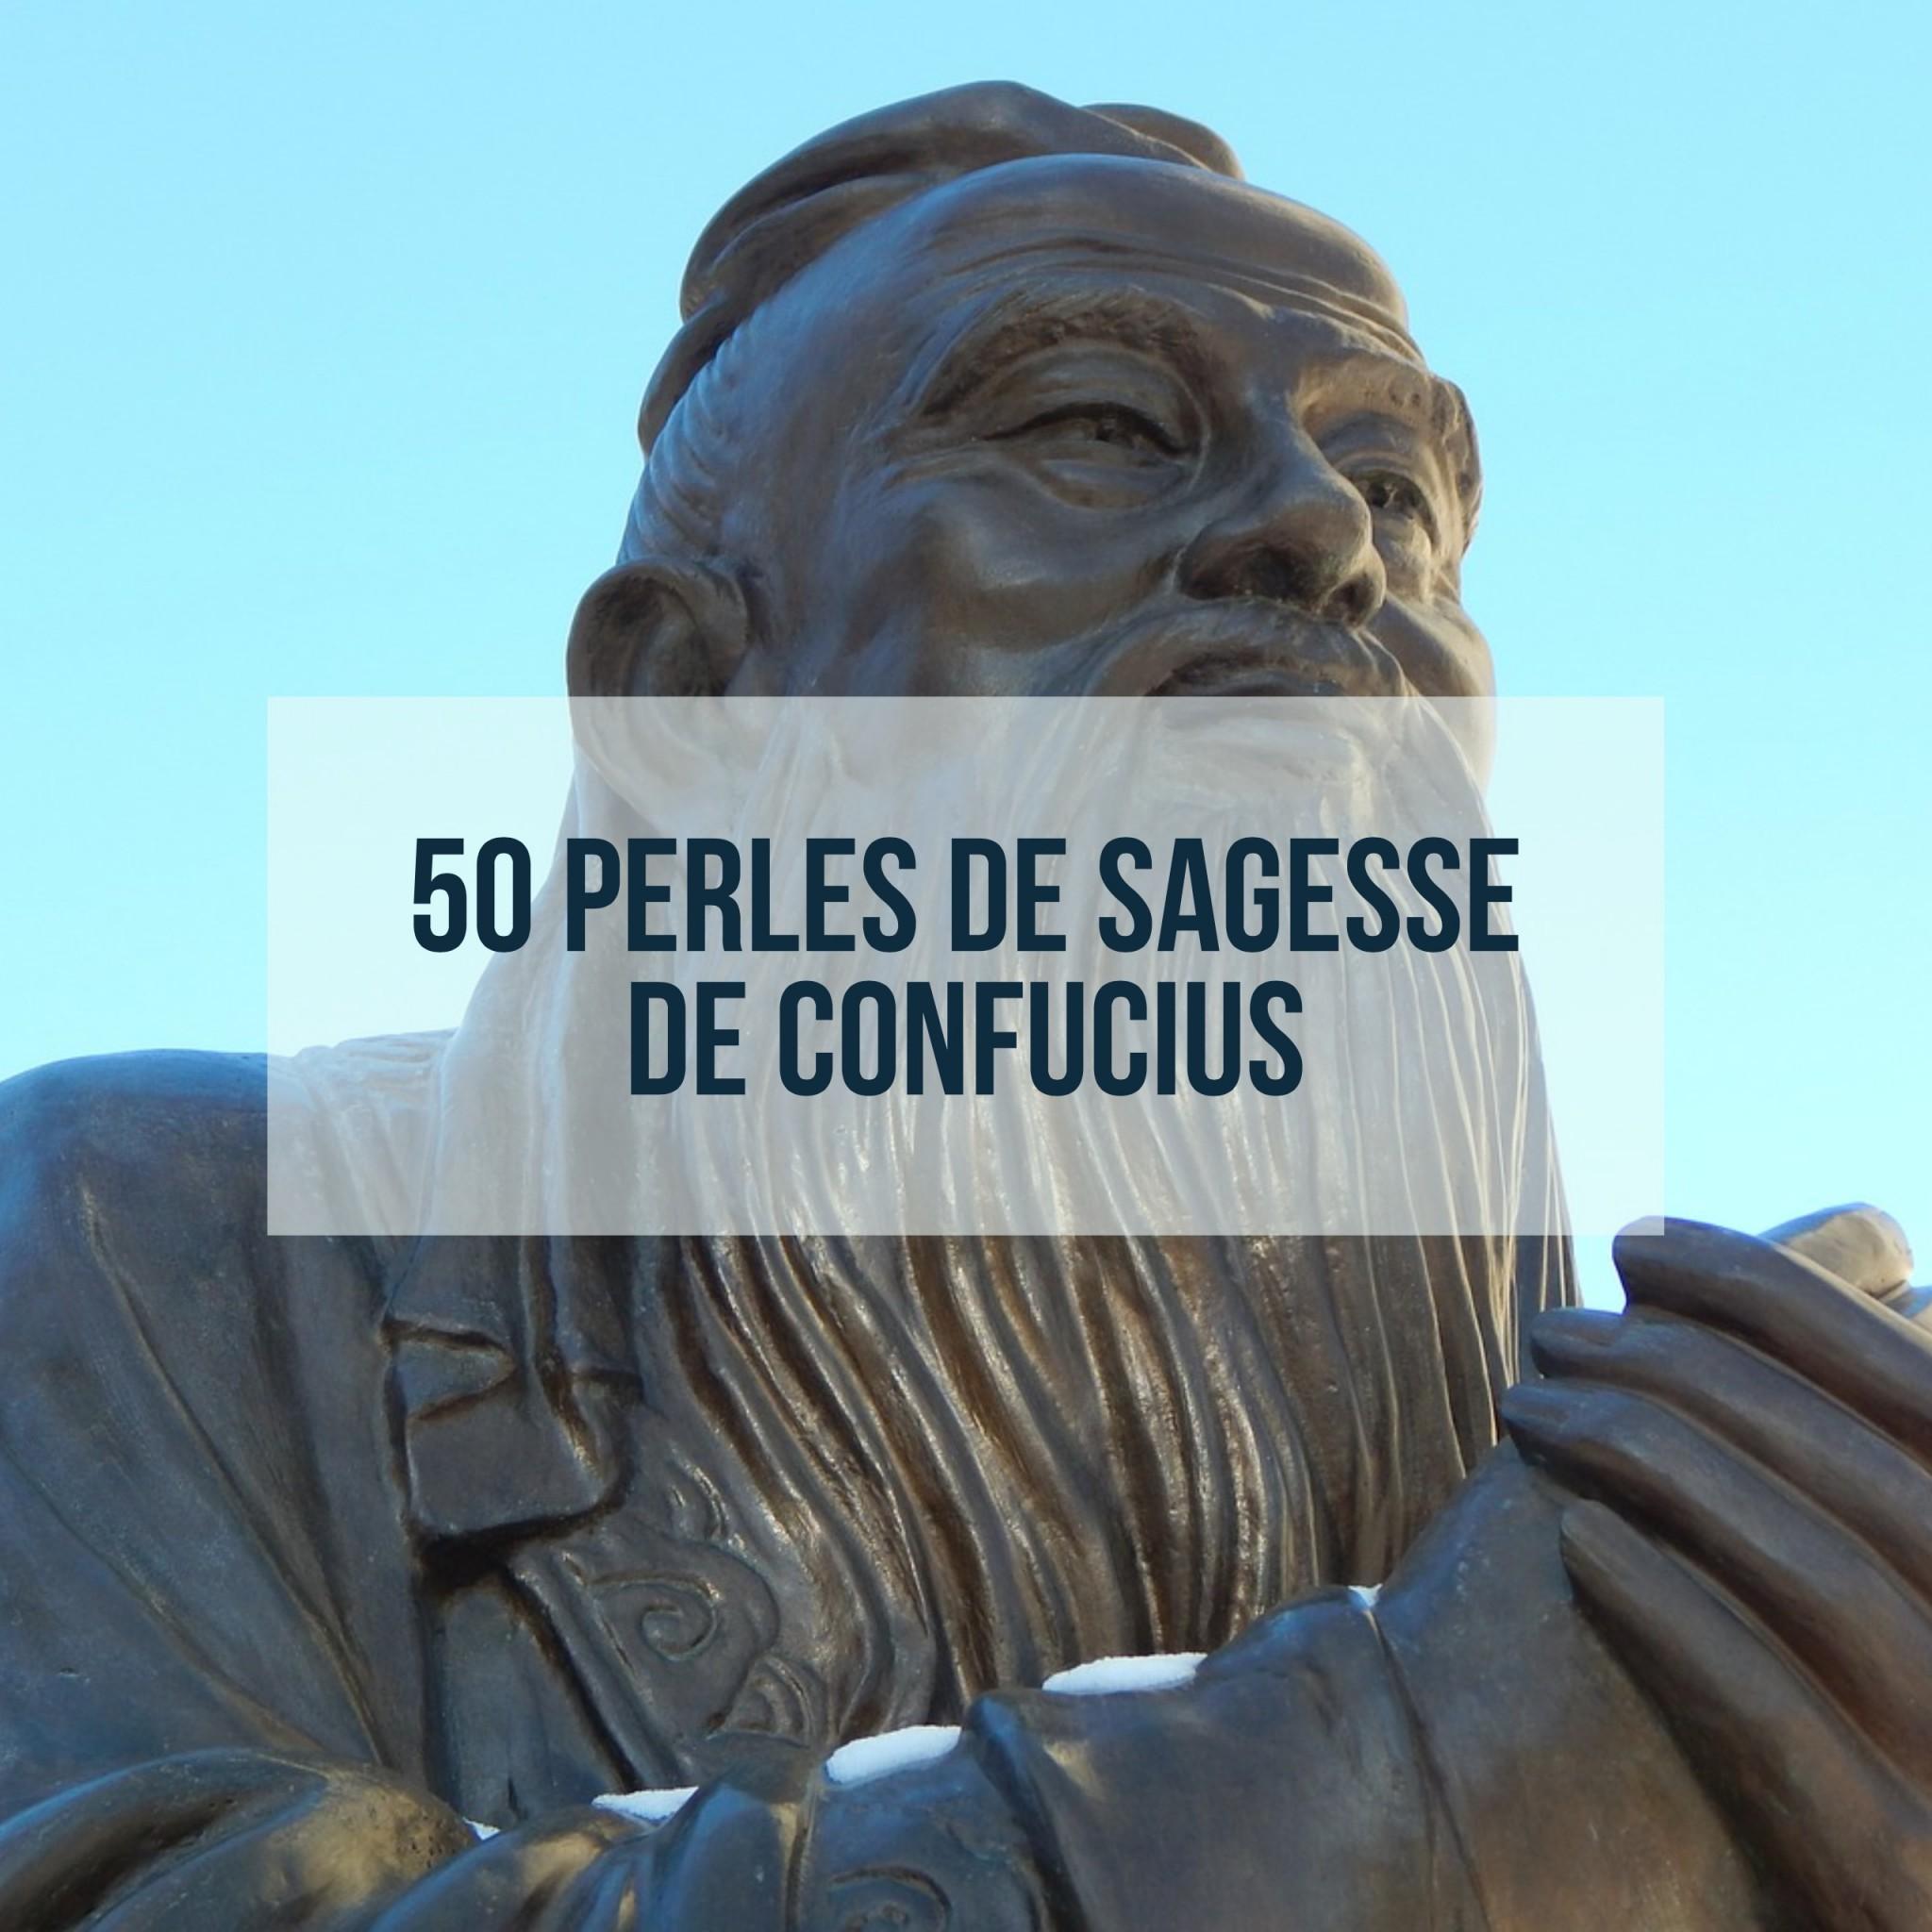 50 perles de sagesse de Confucius